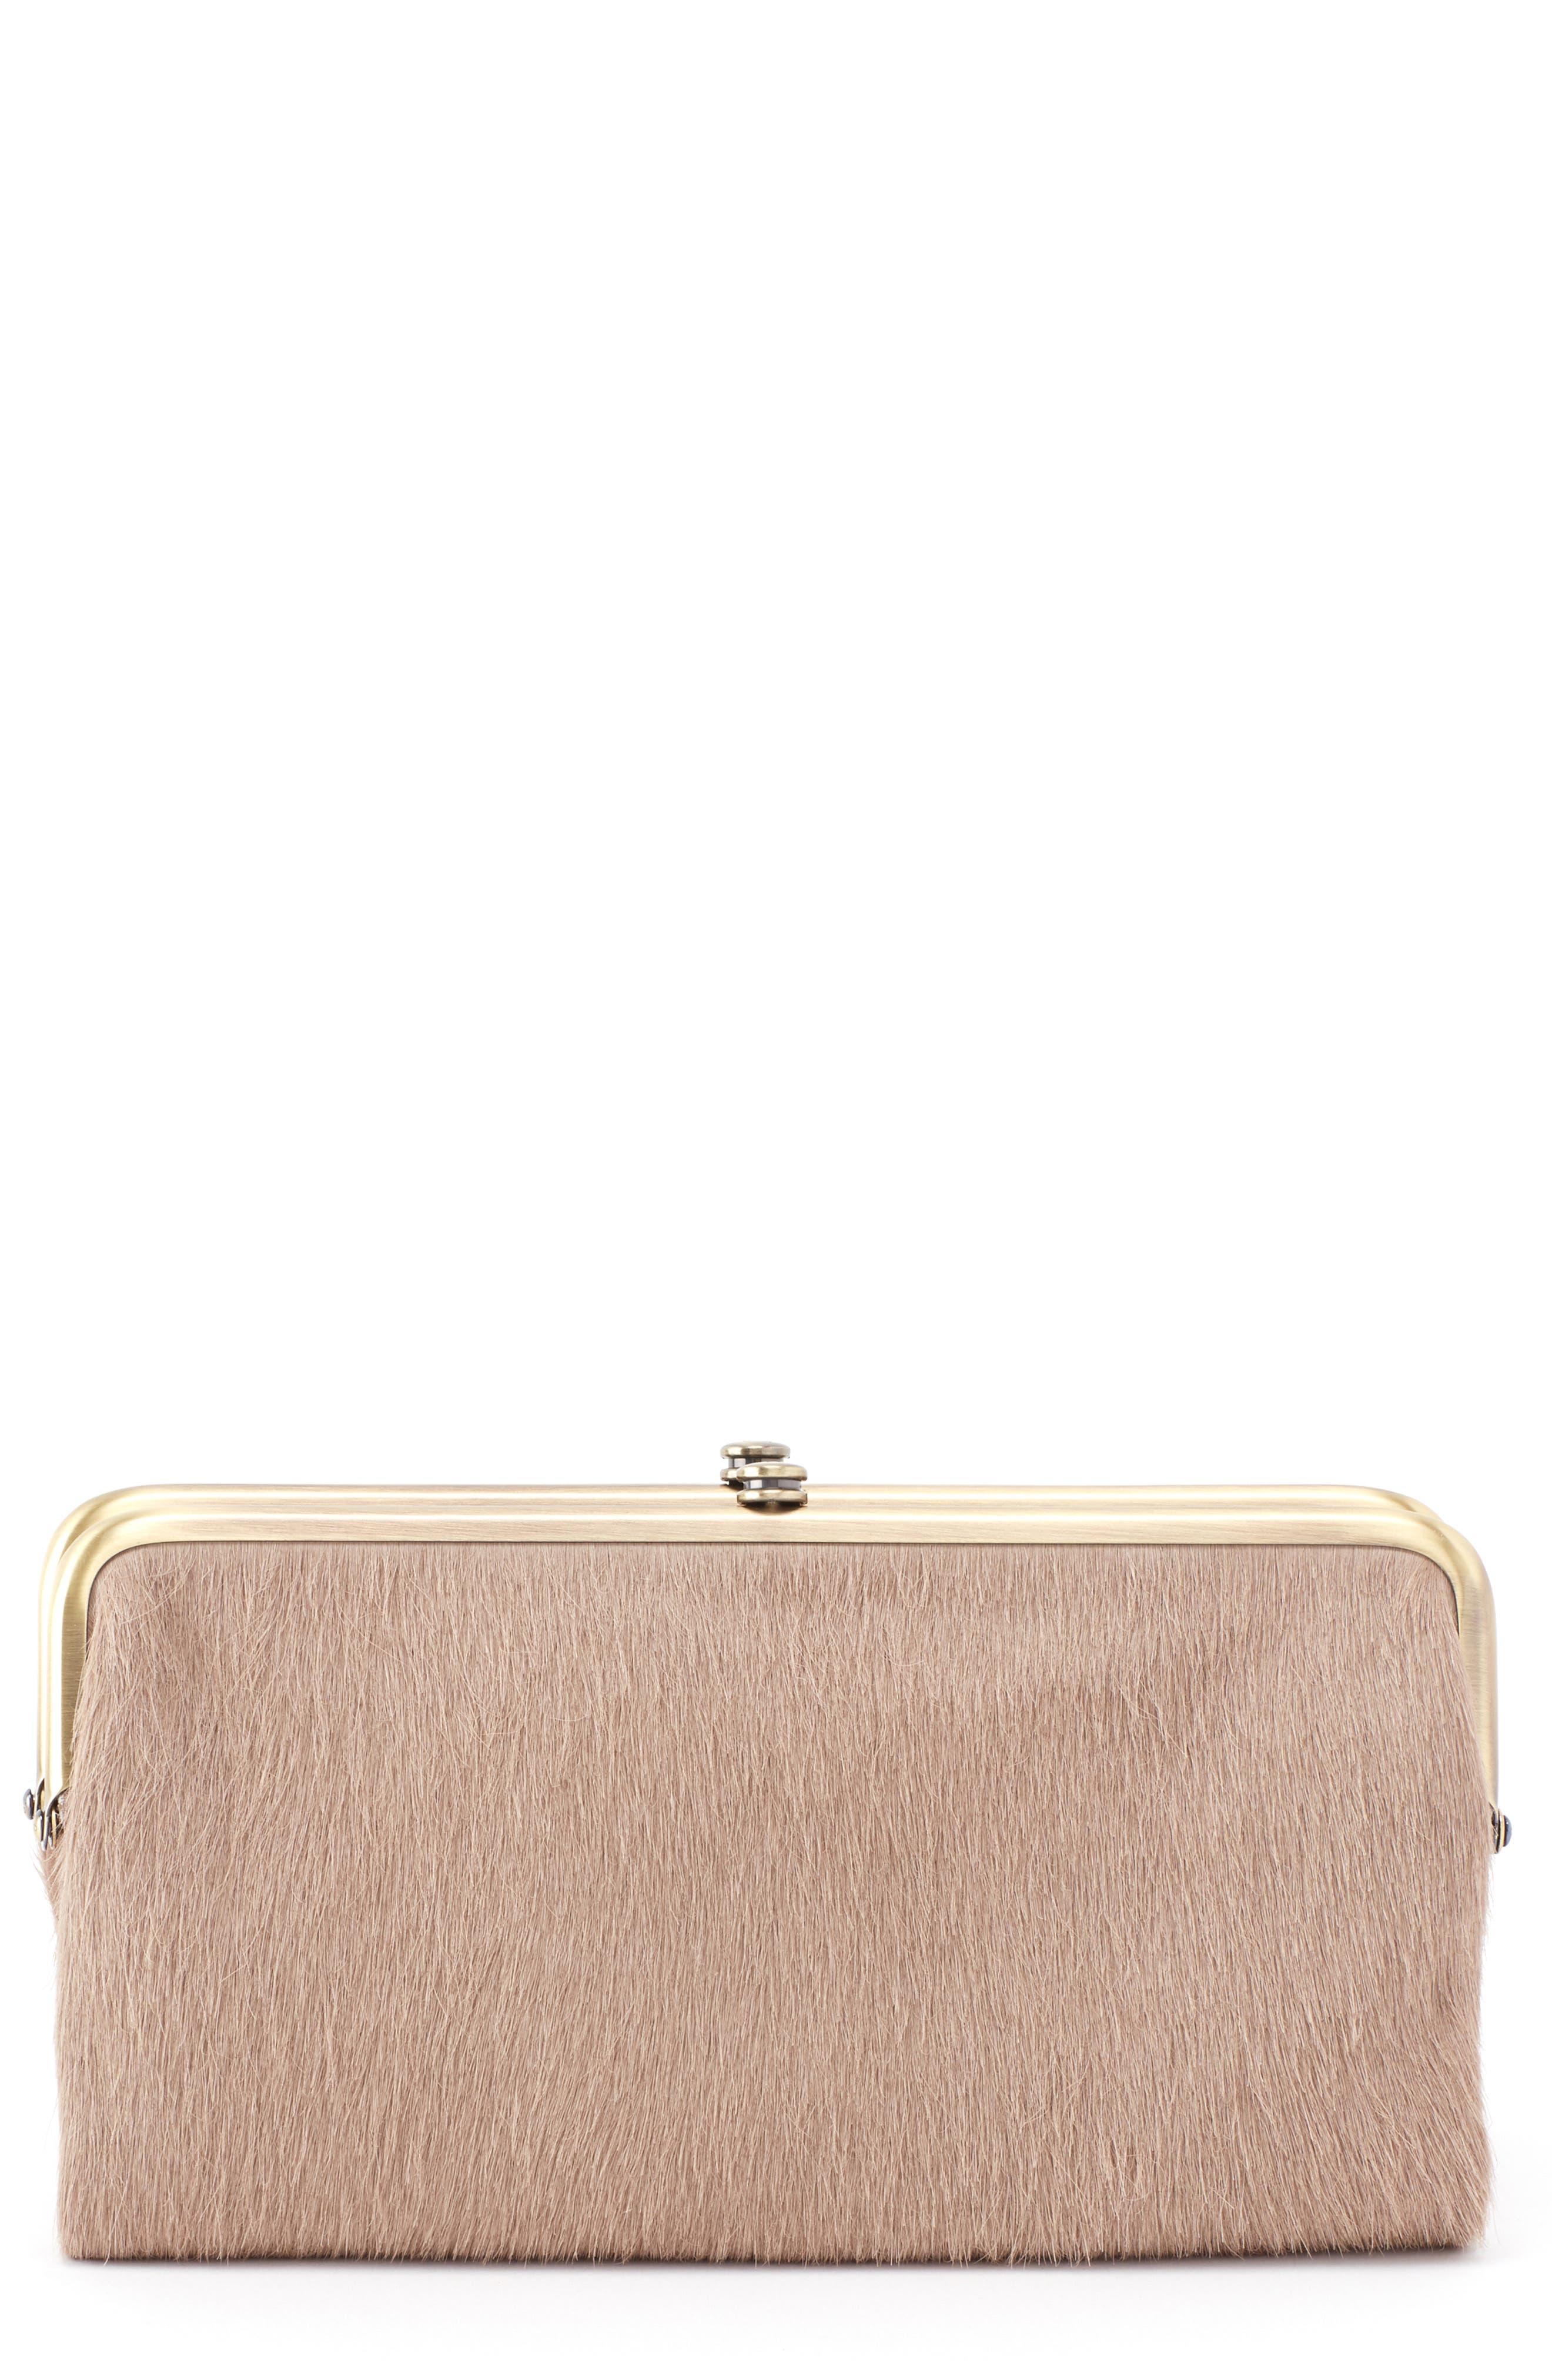 Lauren Colorblock Genuine Calf Hair & Calfskin Leather Wallet,                         Main,                         color, 250